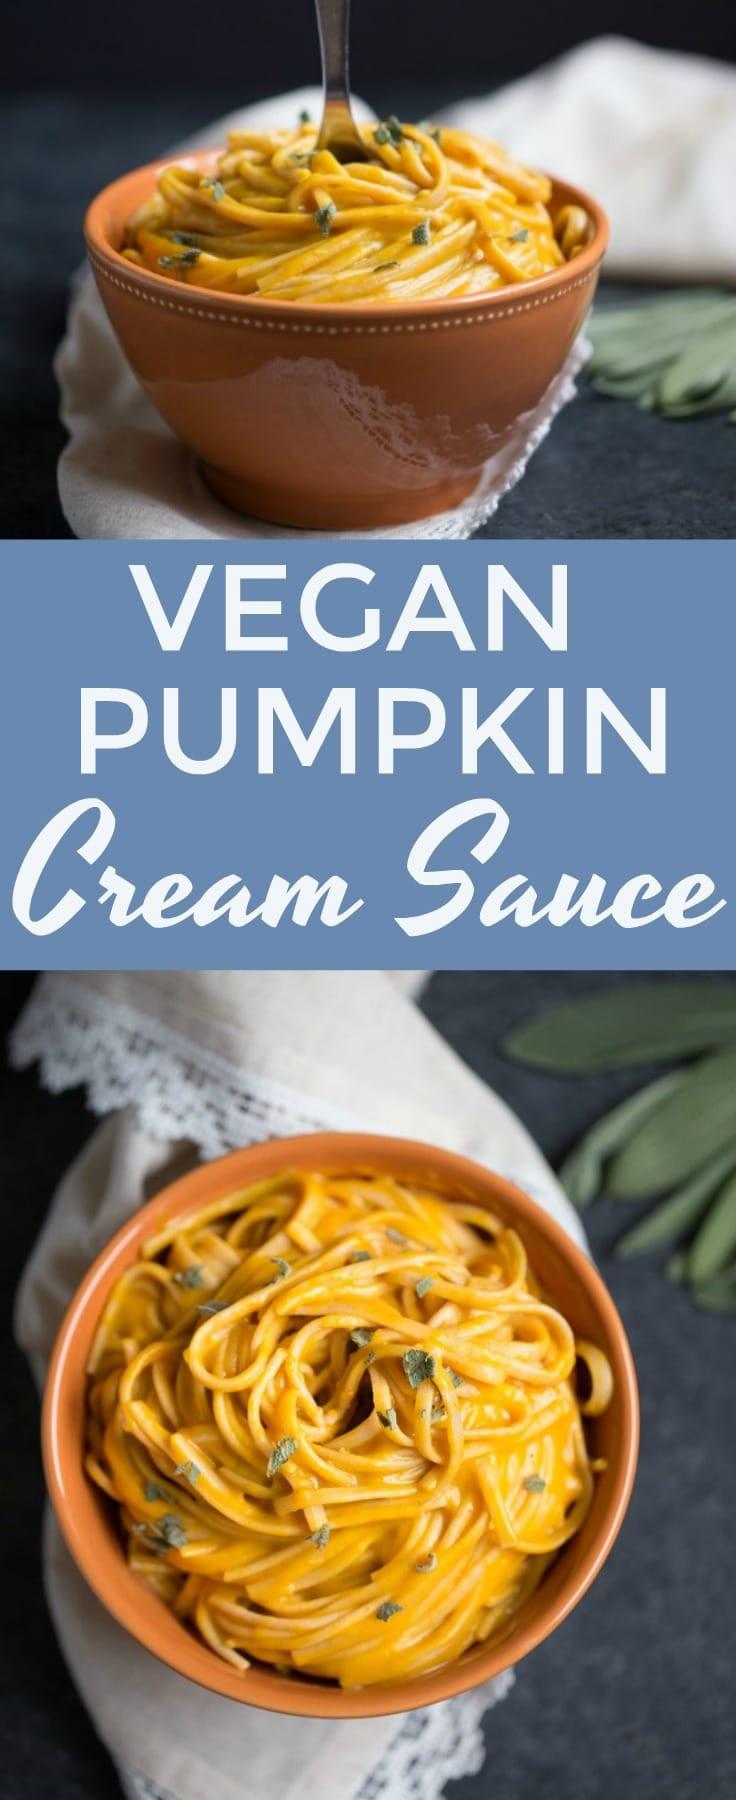 The creamiest #vegan pumpkin cream sauce you'll ever try! Perfect for pasta, dipping, pizza or burritos! #pumpkin #savory #vegetarian